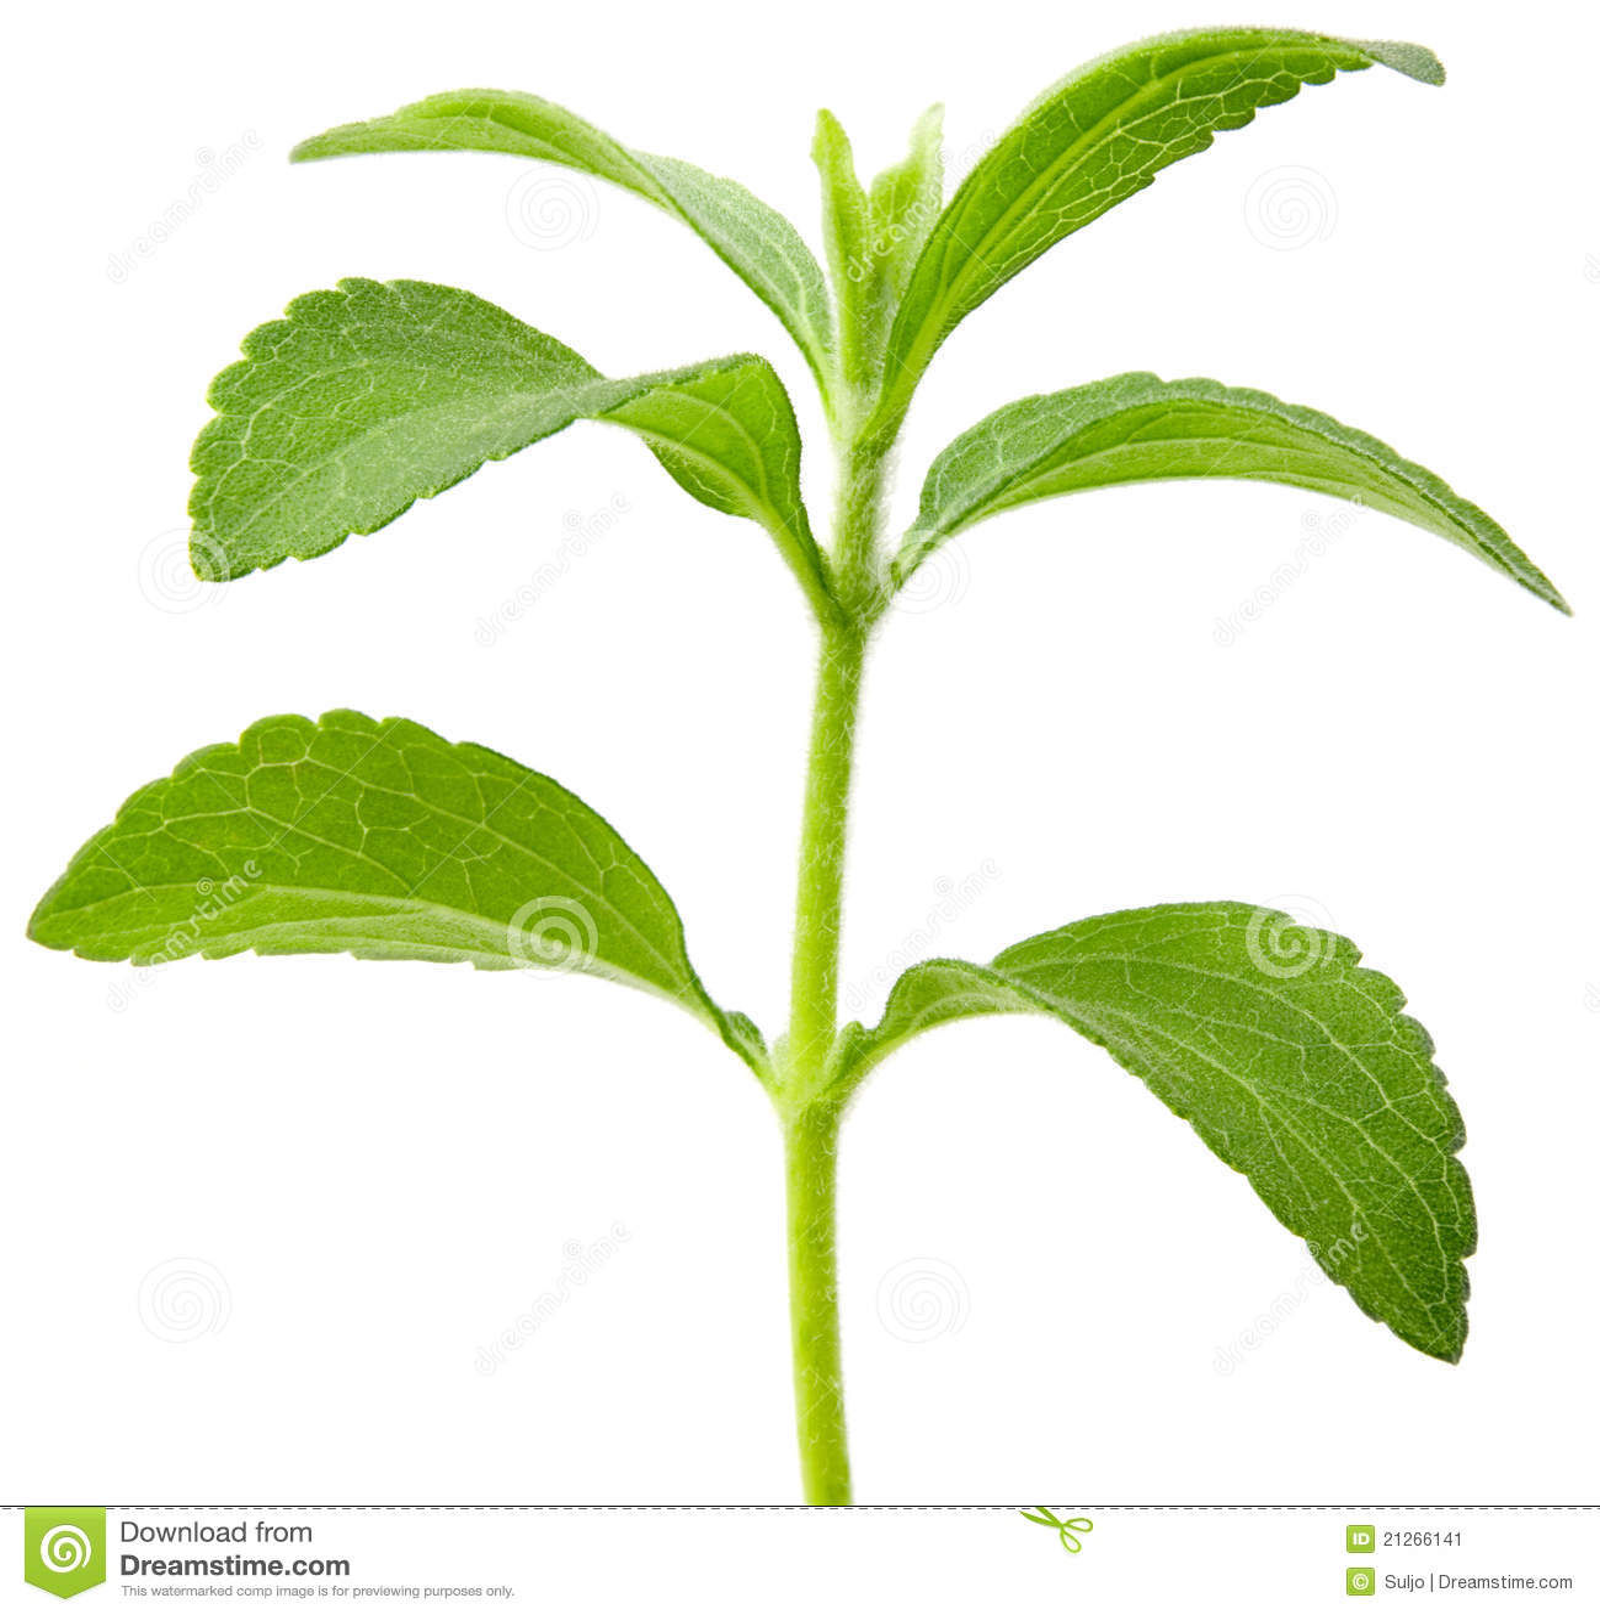 stevia plant cutout stock image image 21266141. Black Bedroom Furniture Sets. Home Design Ideas